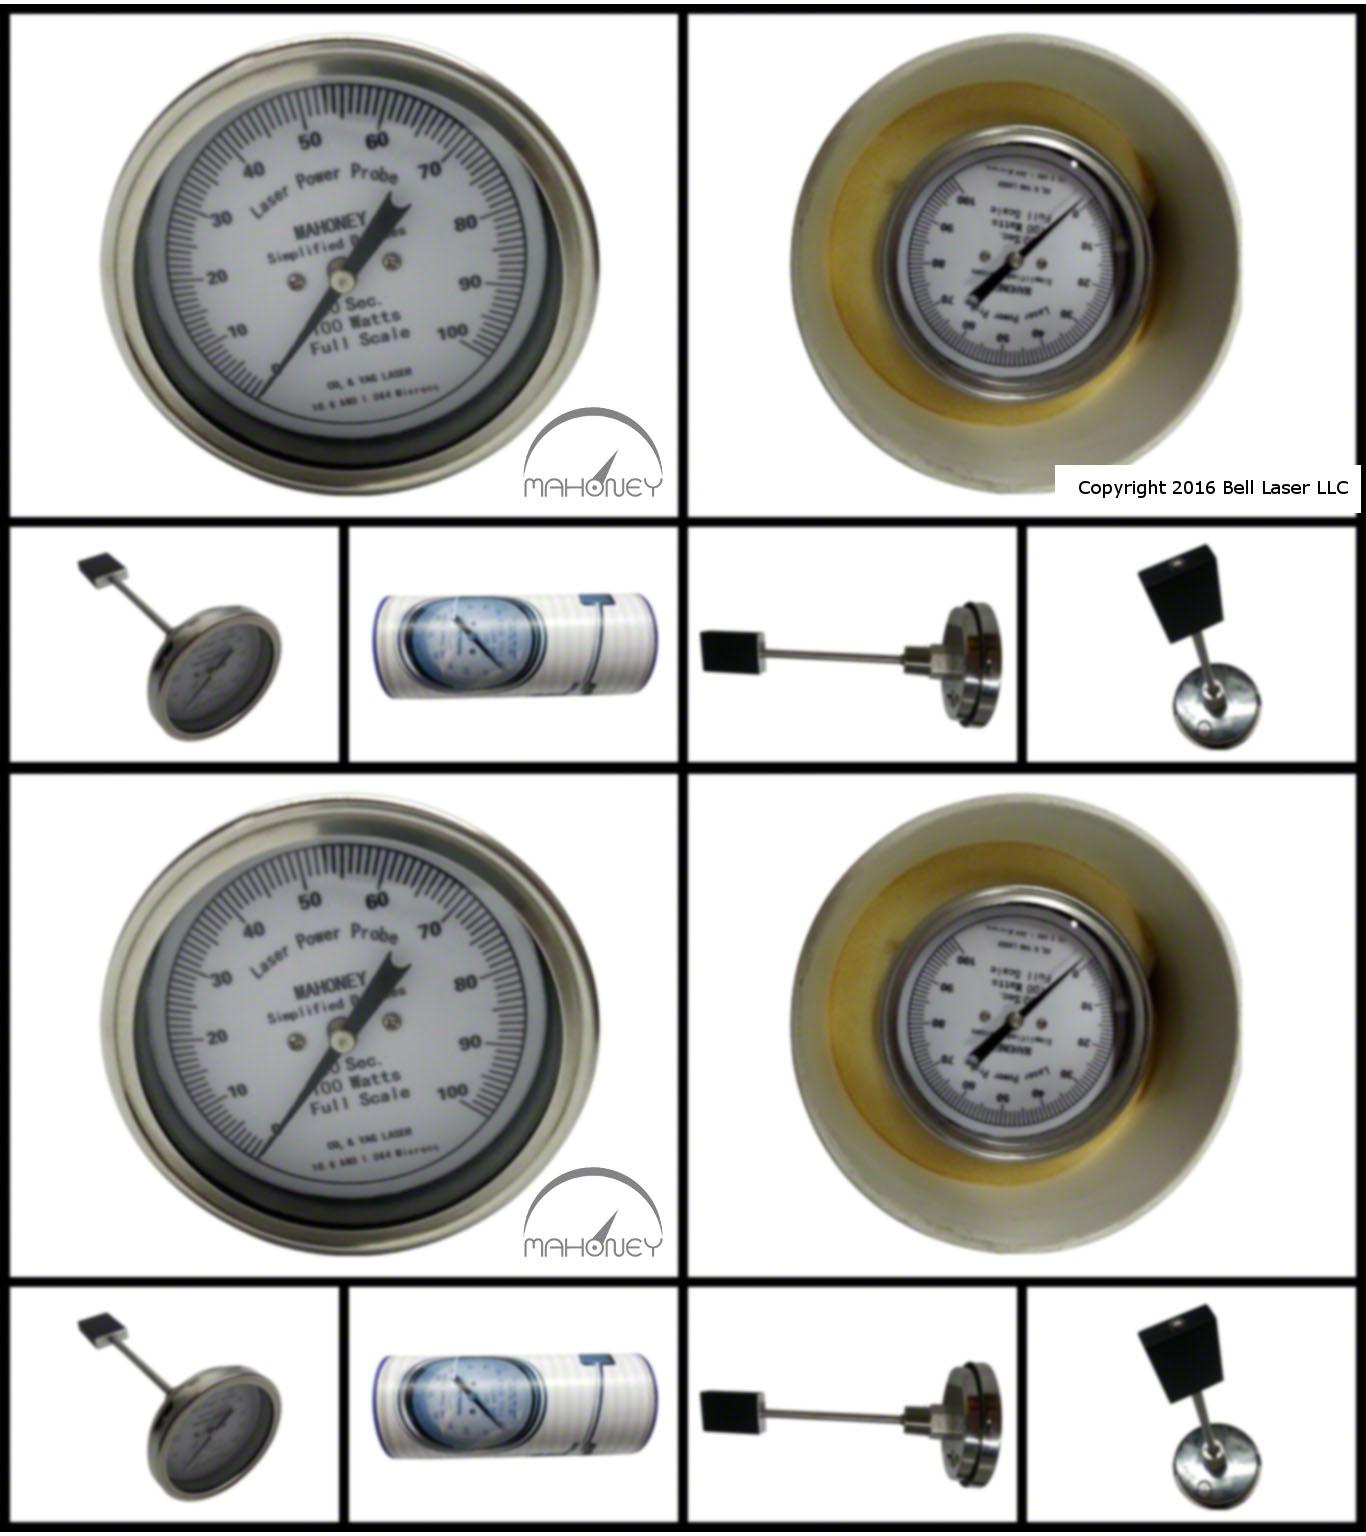 100_watt_Mahoney_CO2_laser_power_meter_probe_collage_x2_Mahoney